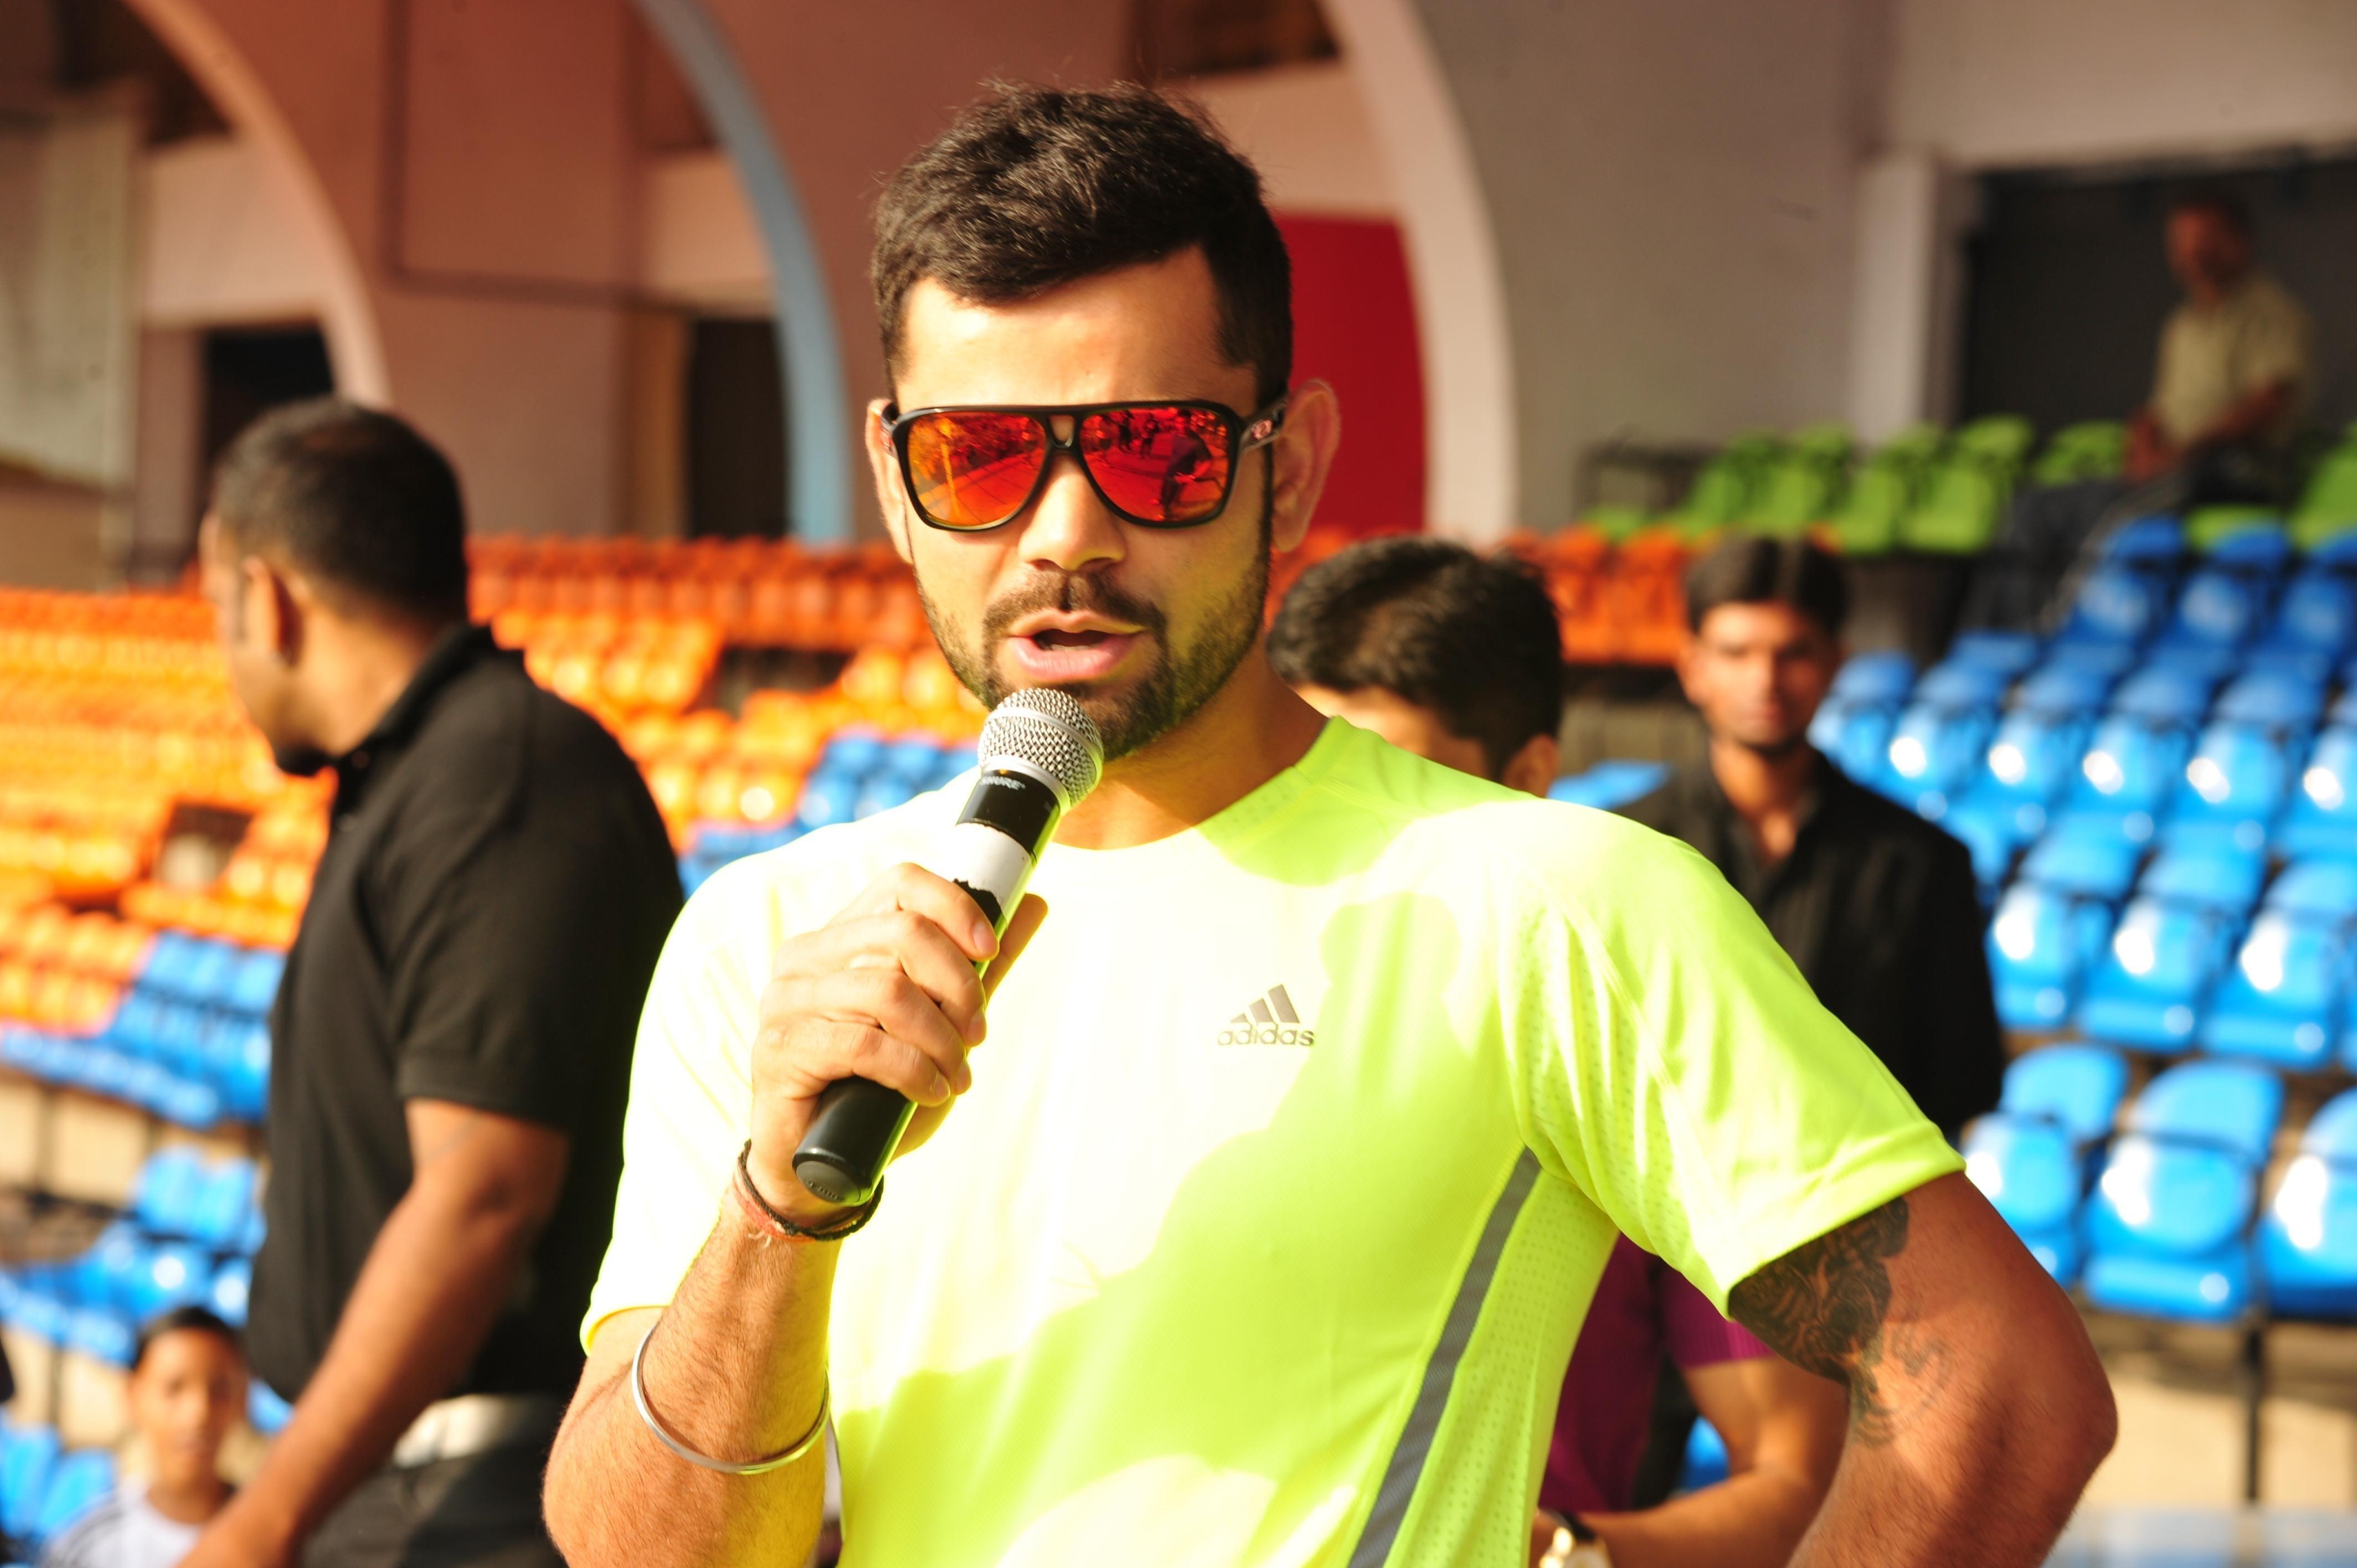 Virat Kohli adidas athlete addressing the runners before adidas Boost your run marathon